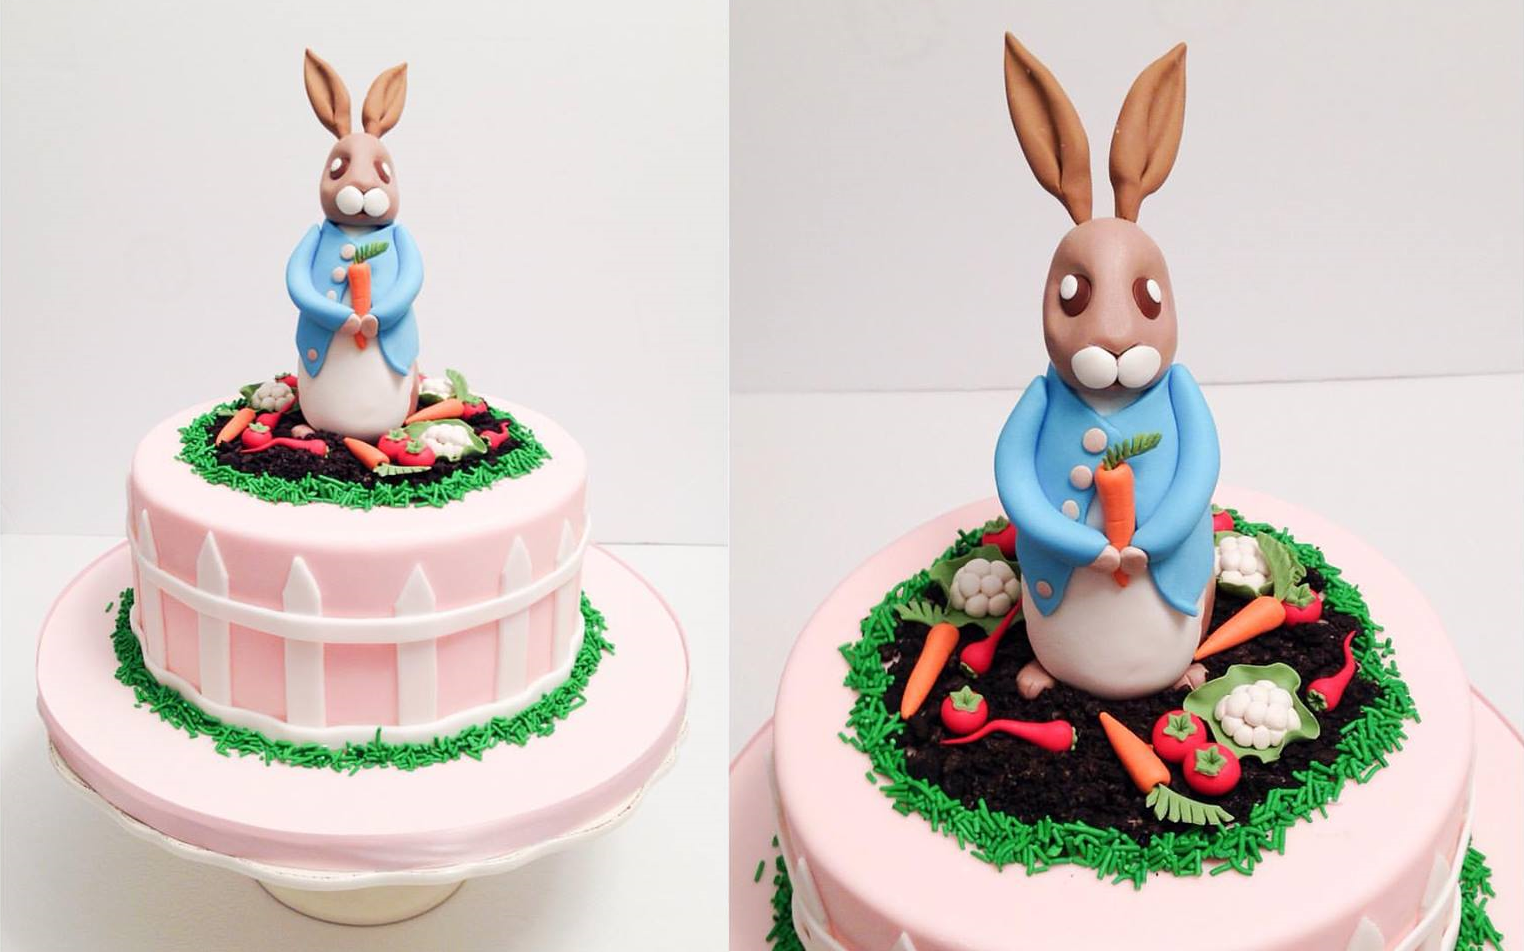 Peter Rabbit Cake edited.png